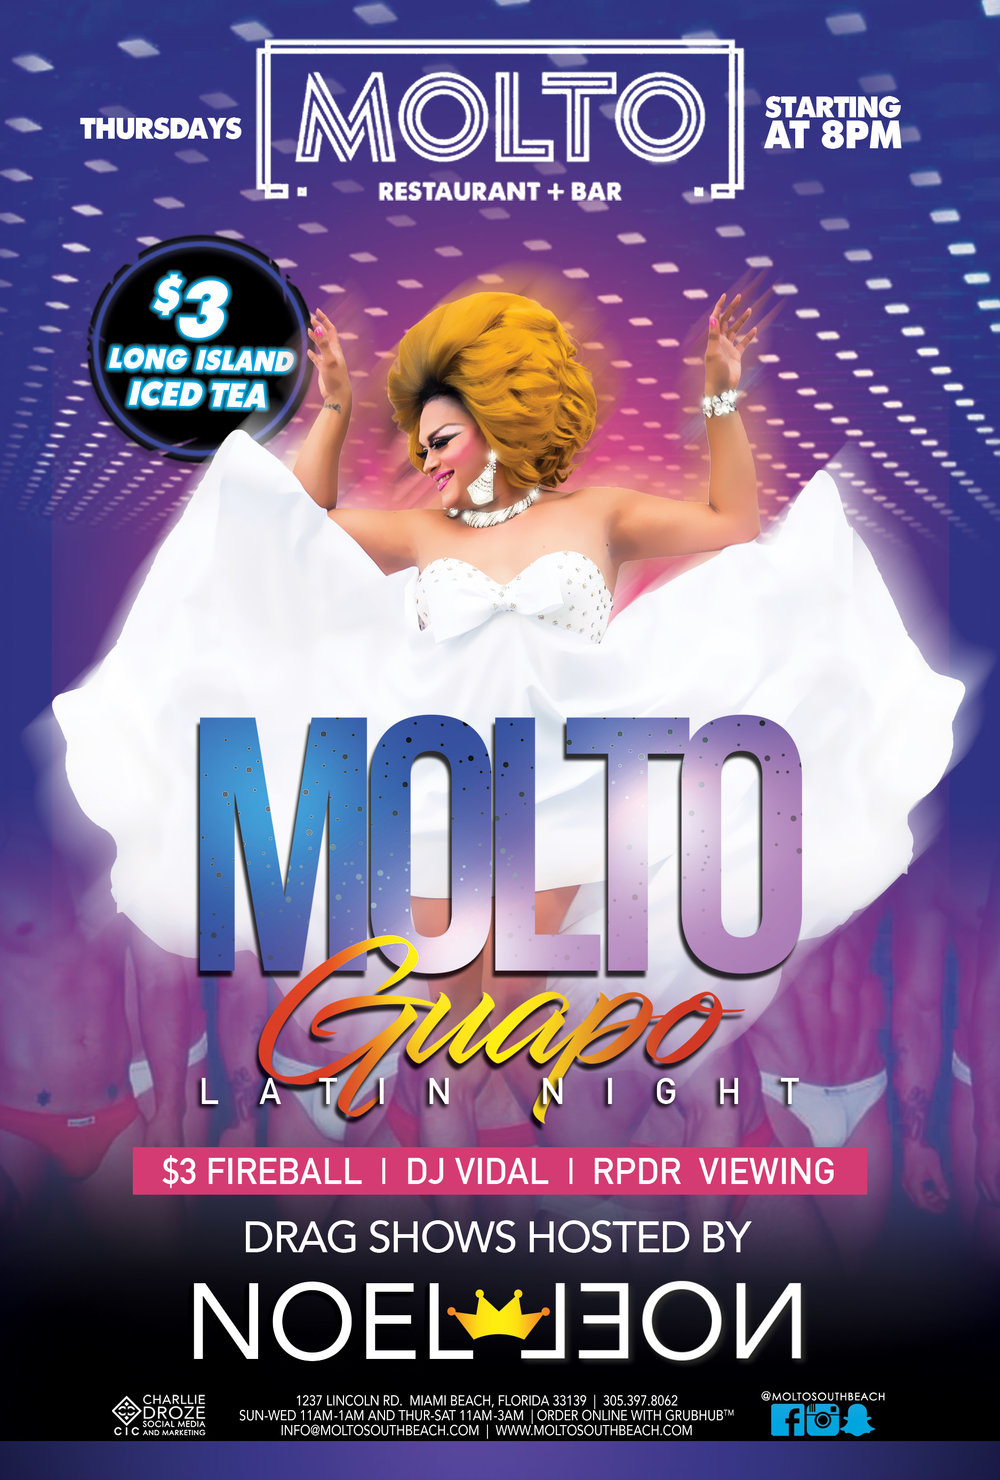 MOLTO GUAPO  - THURSDAYS